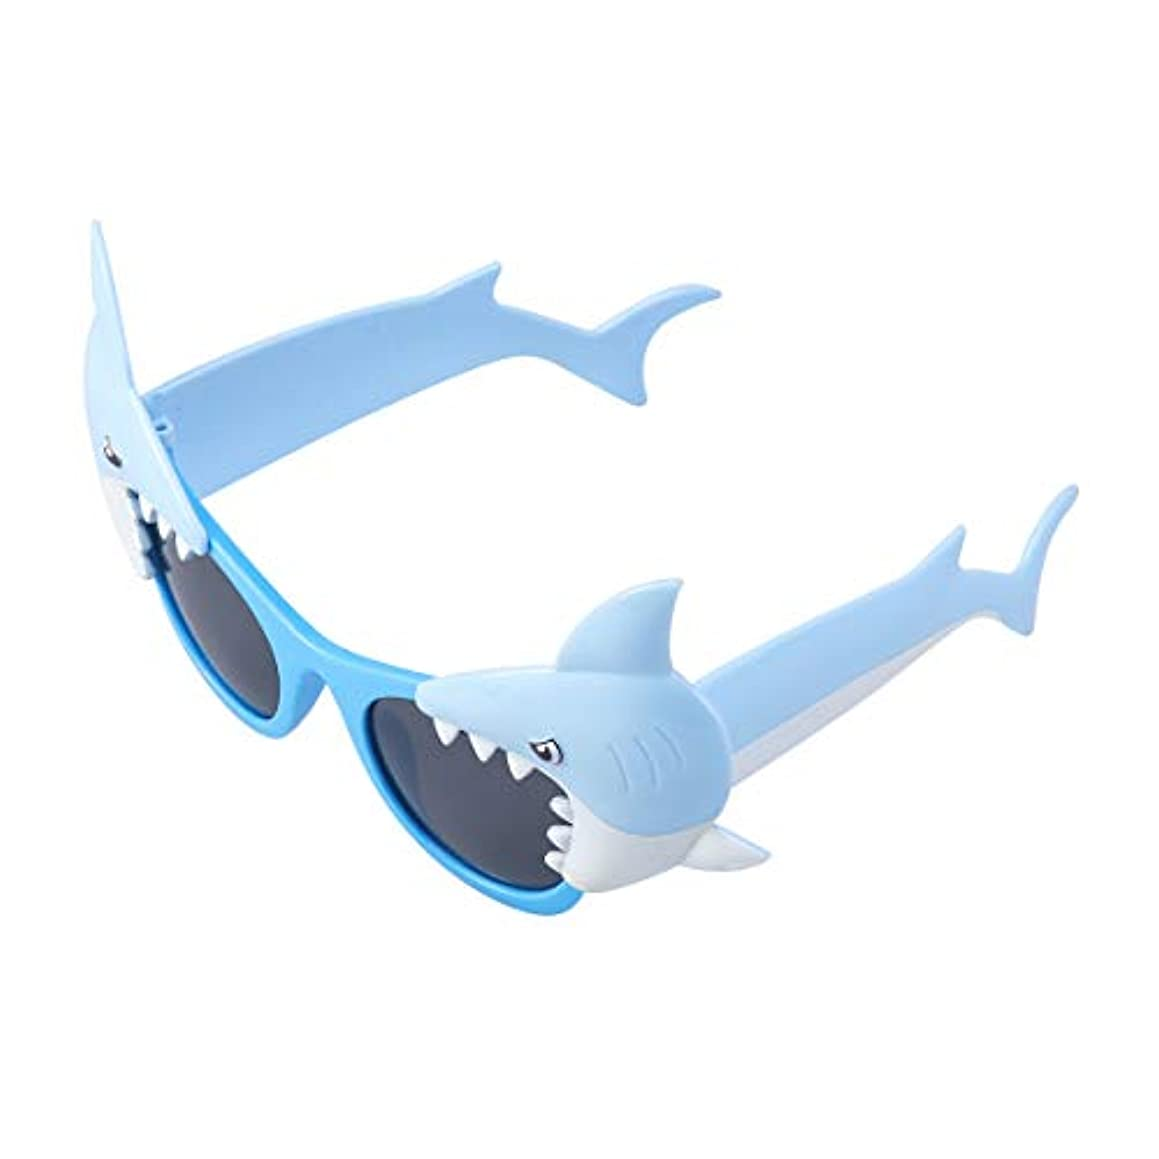 BESTOYARD パーティーサングラスサメの形ノベルティおかしい眼鏡用仮装トリックパーティーコスチューム小道具